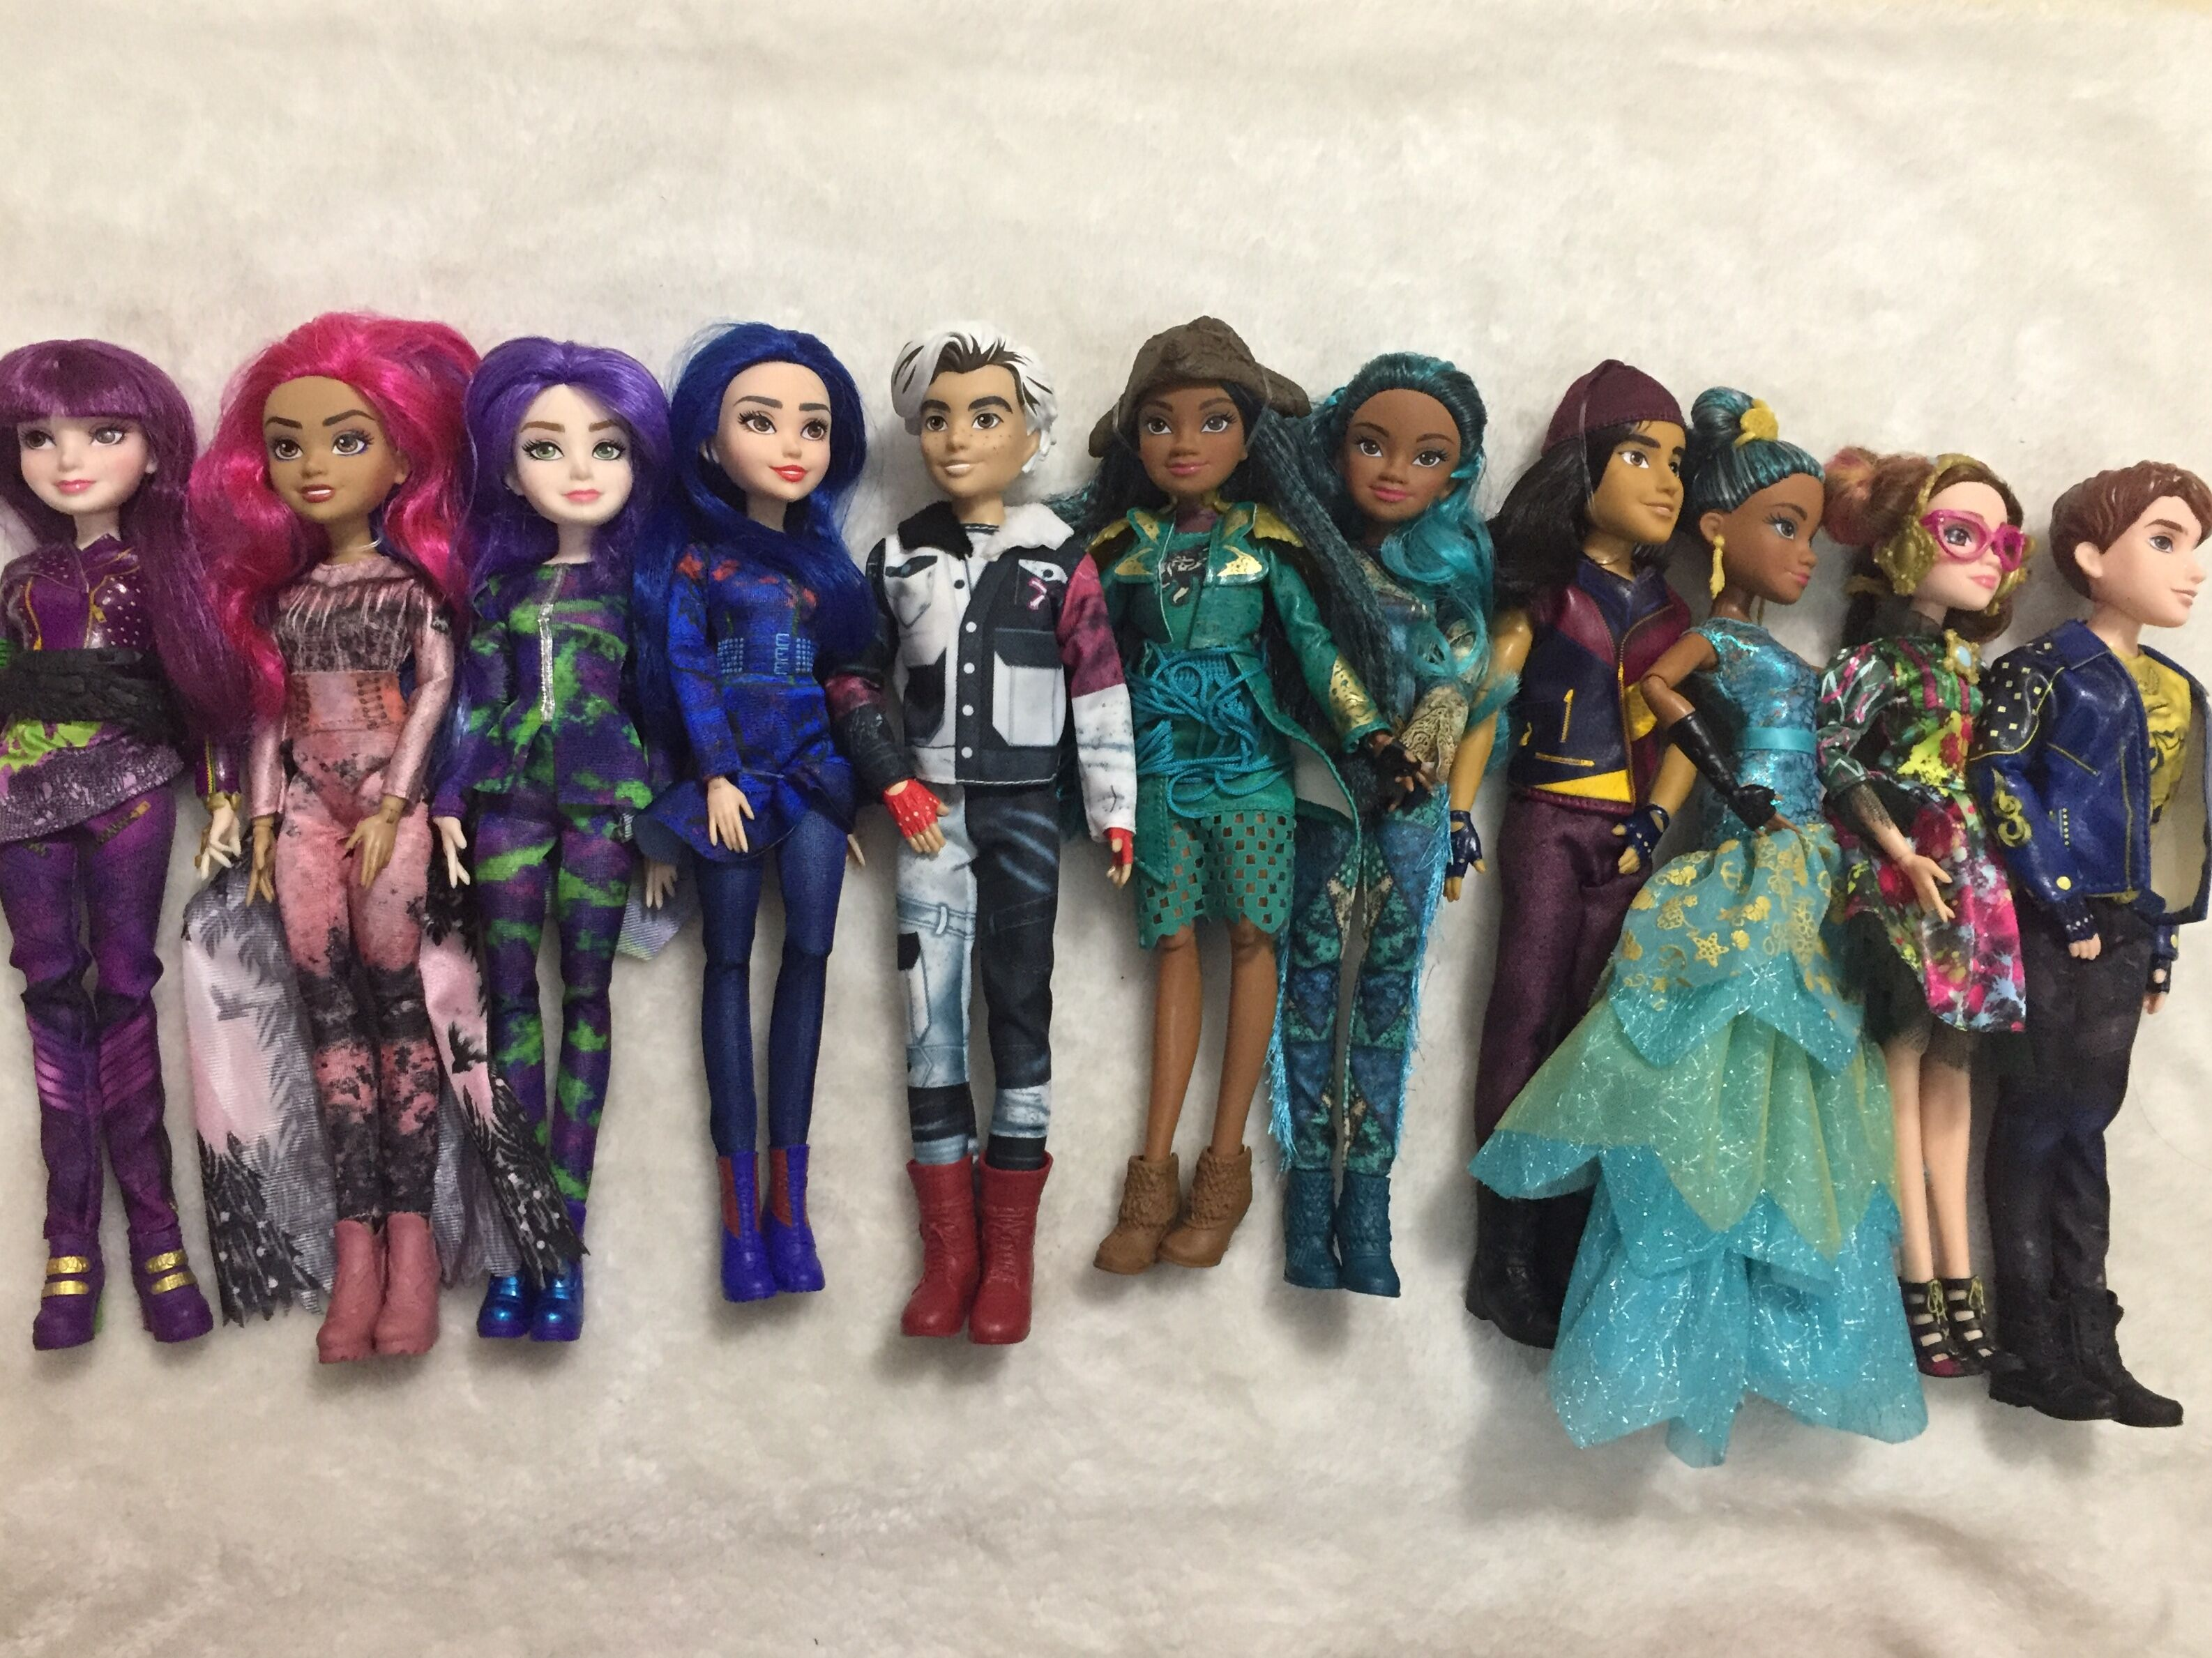 Original 11'' Descendants Doll Action Figure Doll Maleficent  Evie Mal Descendants 3 Kids Toy Carlos Joy